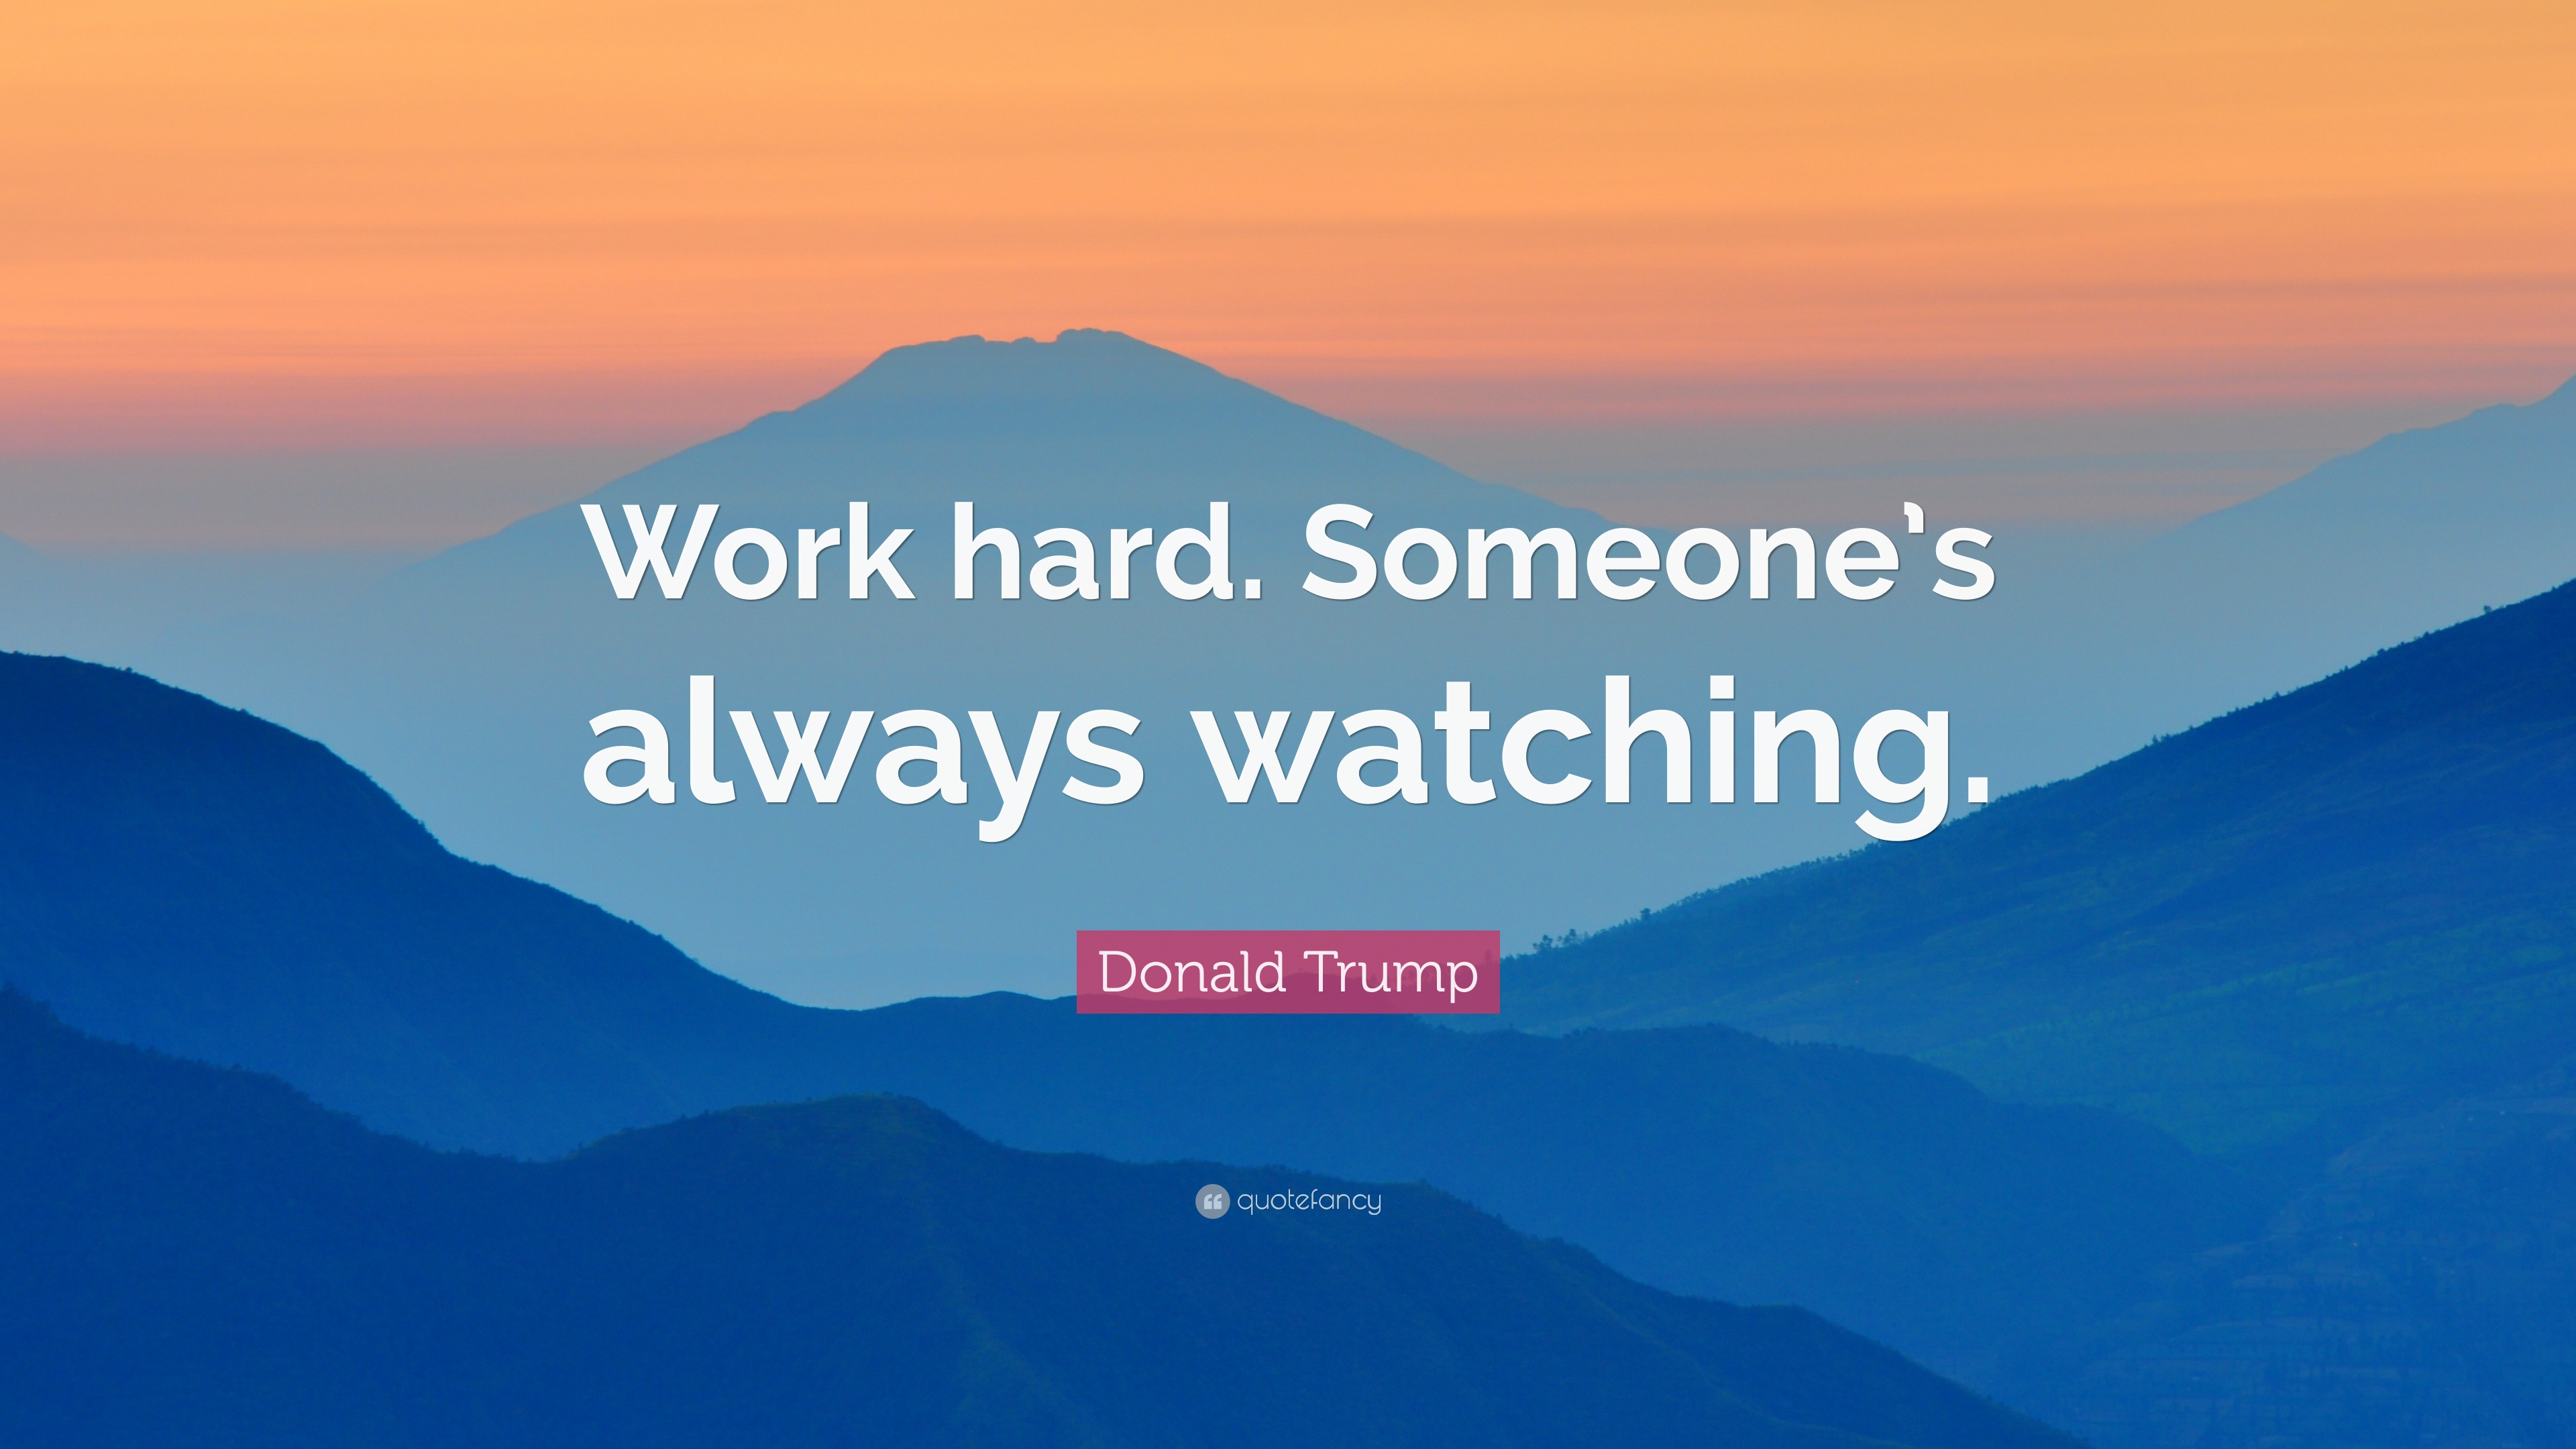 Hard Work Quotes Someones Always Watching Donald Trump